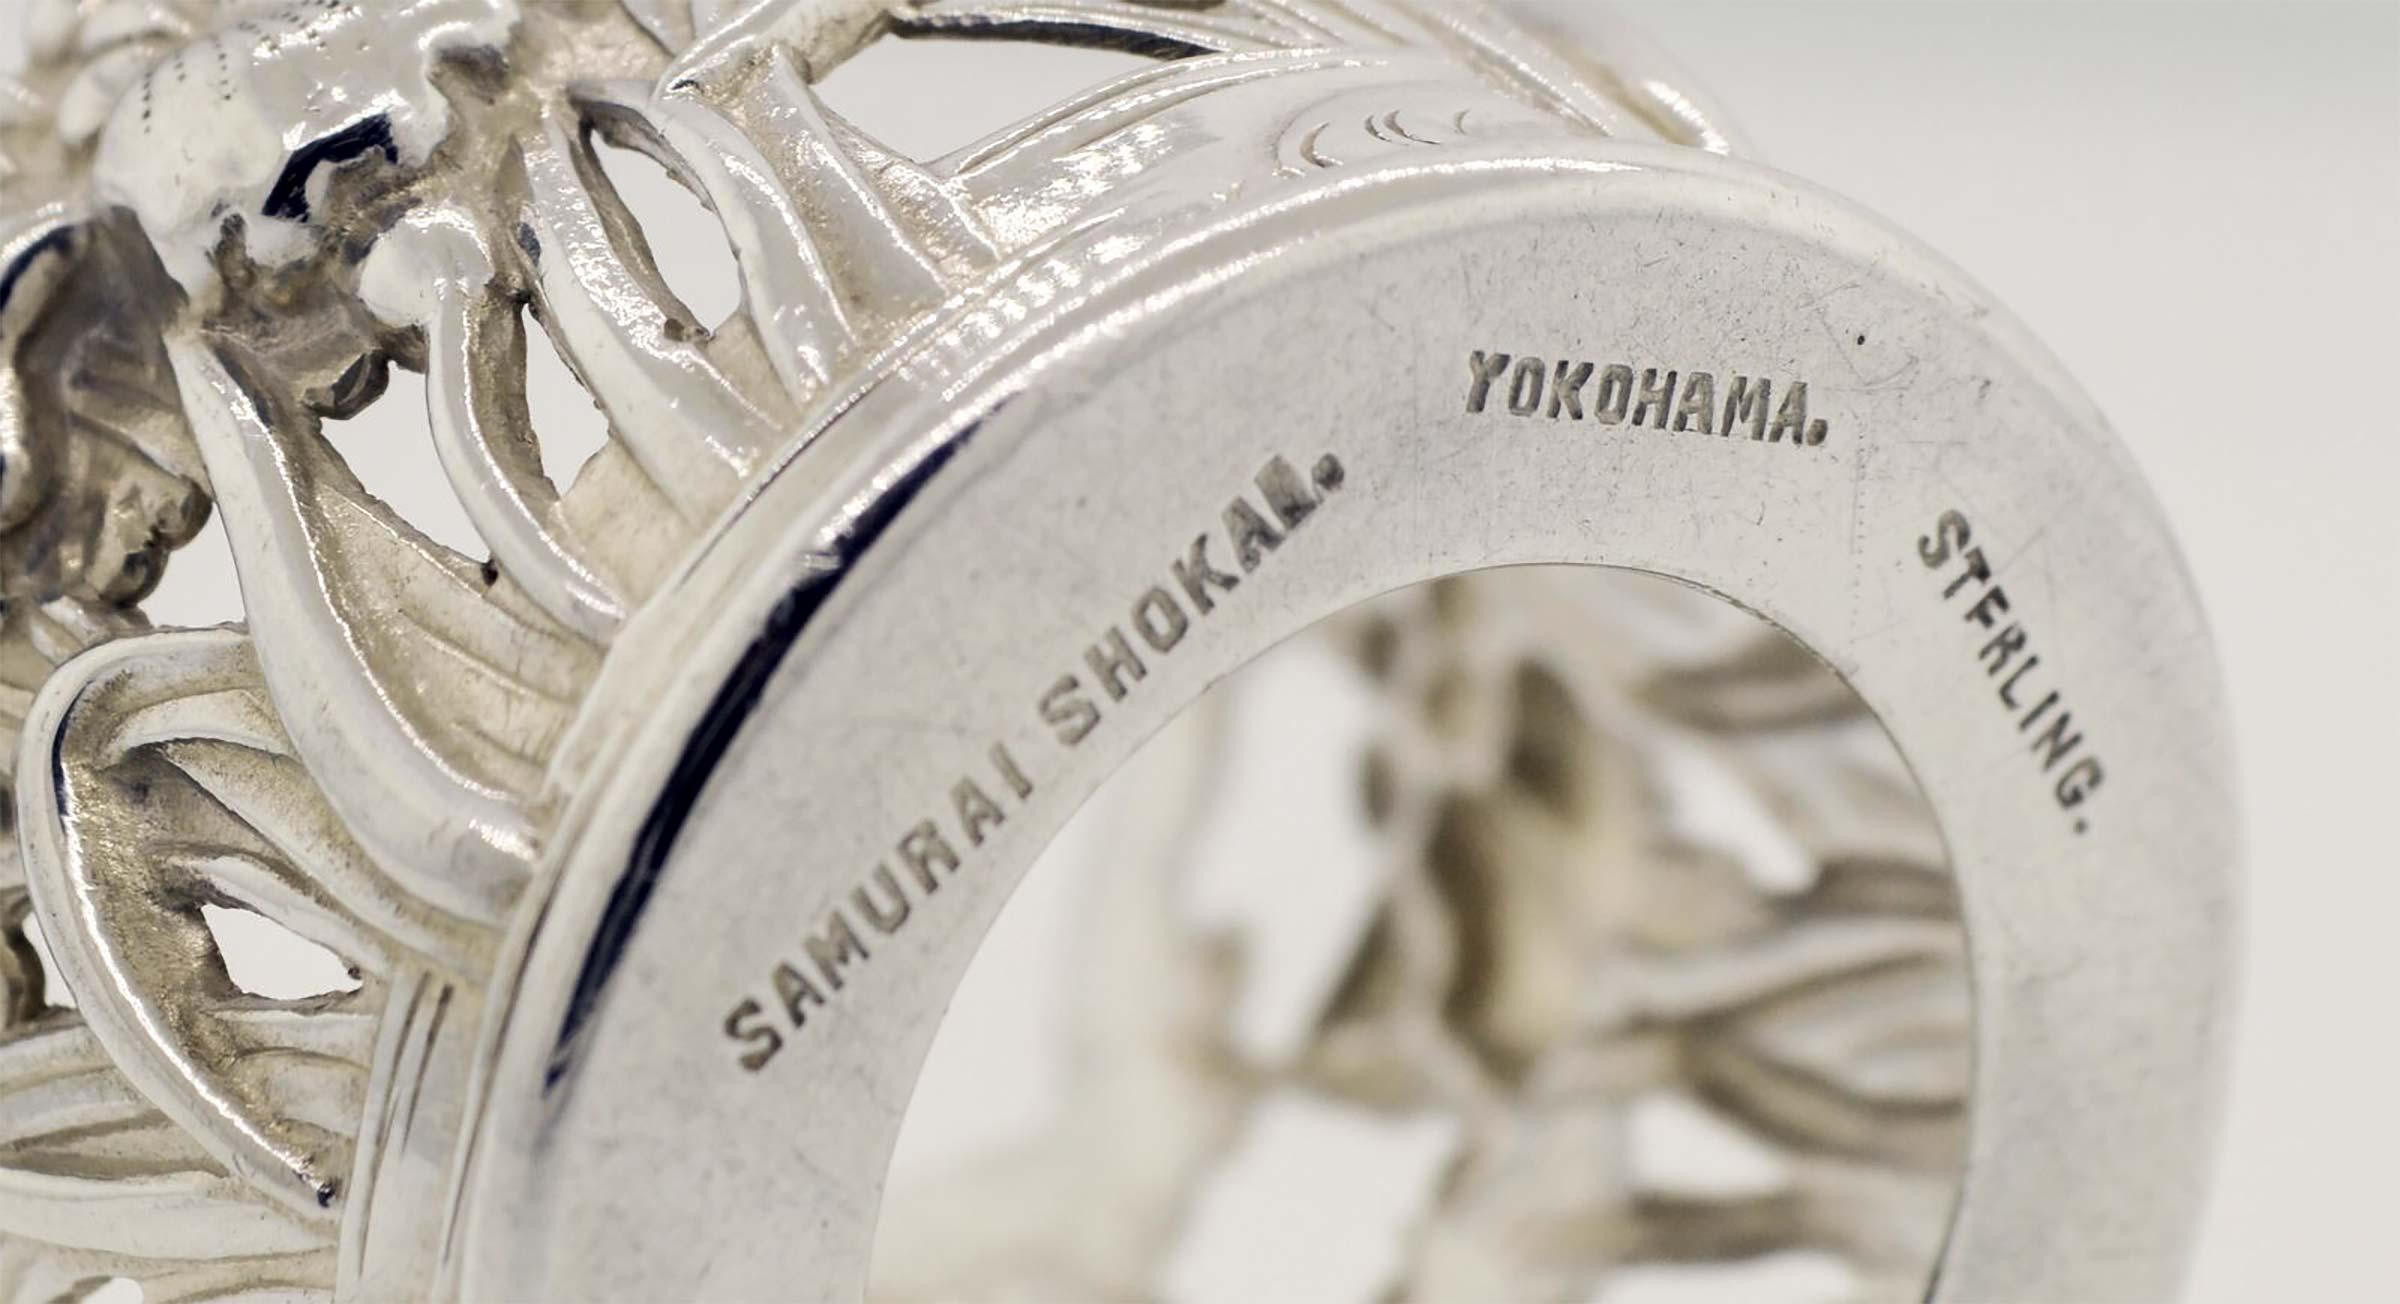 Samurai Shokai Front